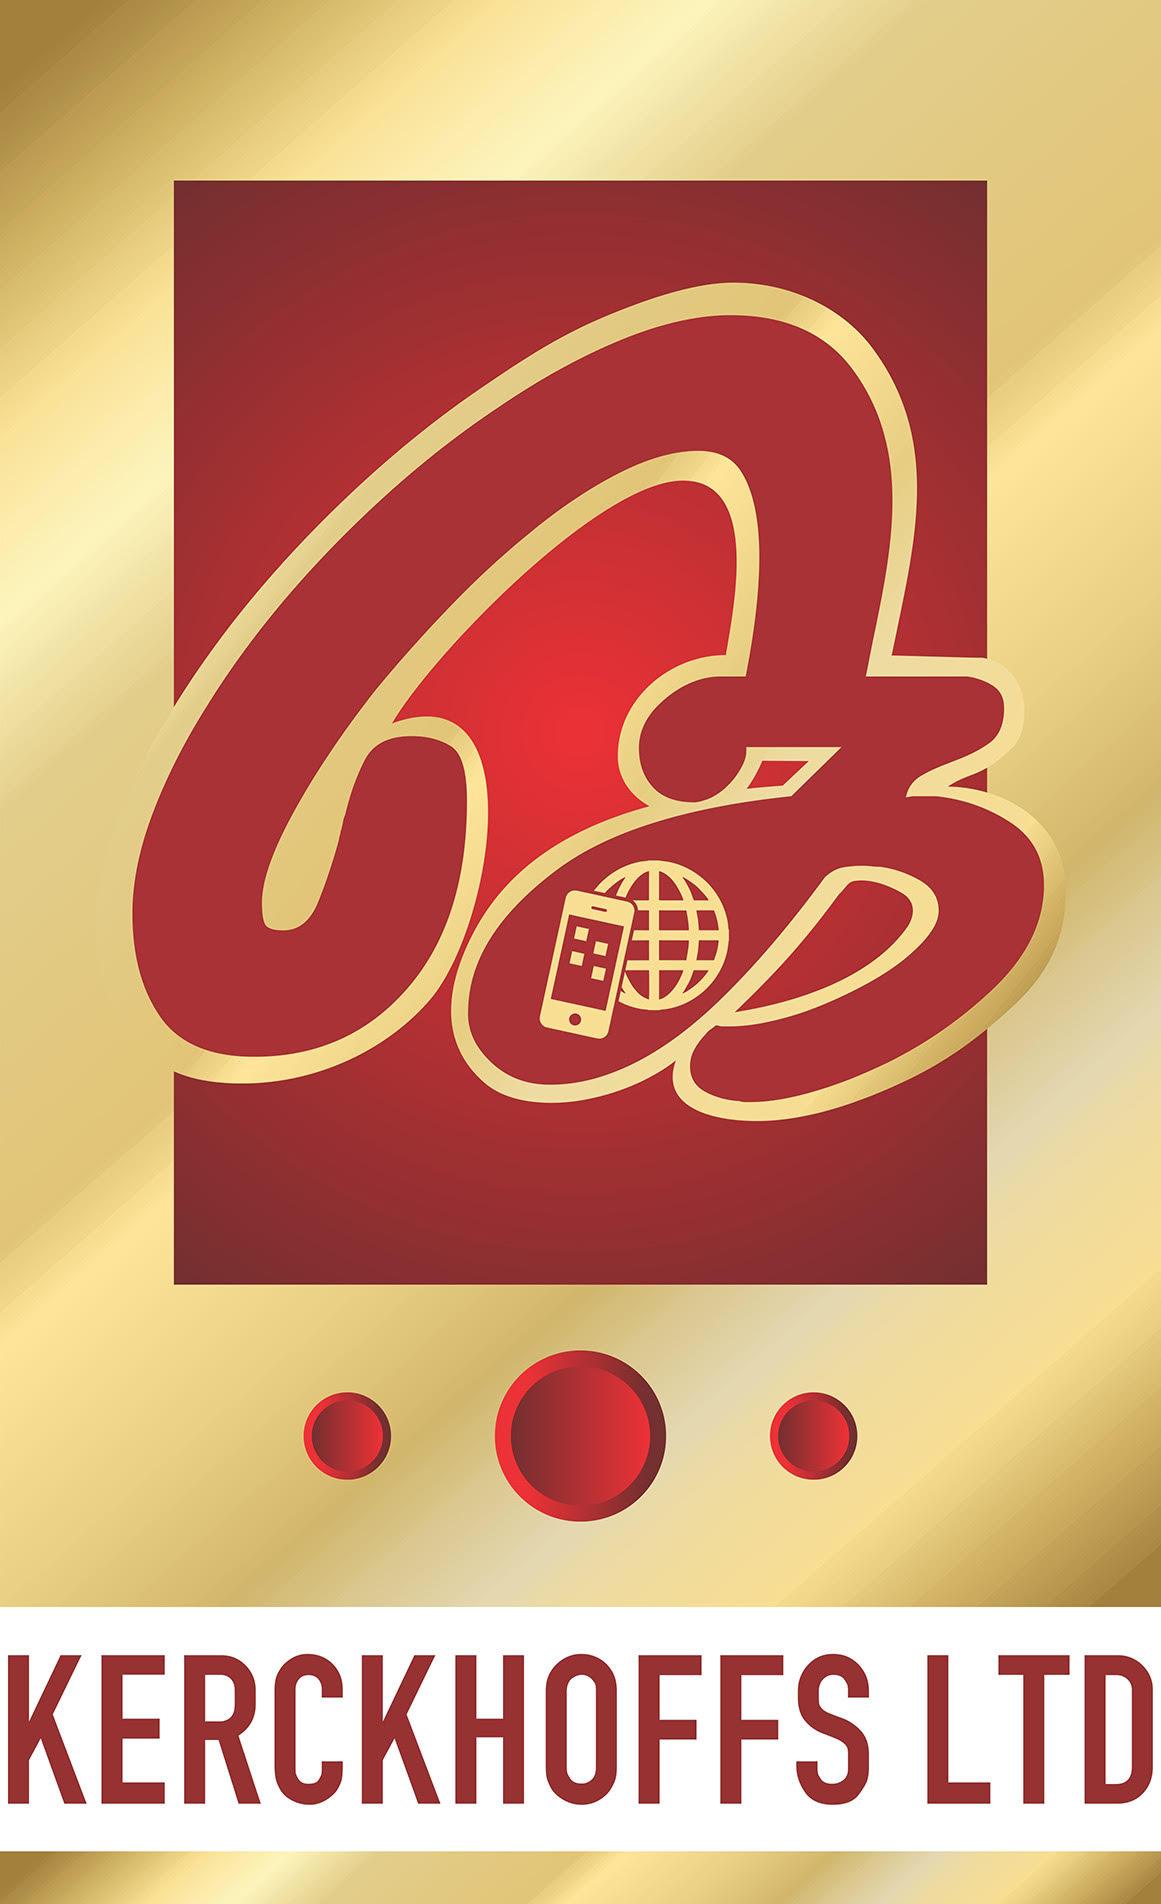 logo of Kerckhoffs Ltd.